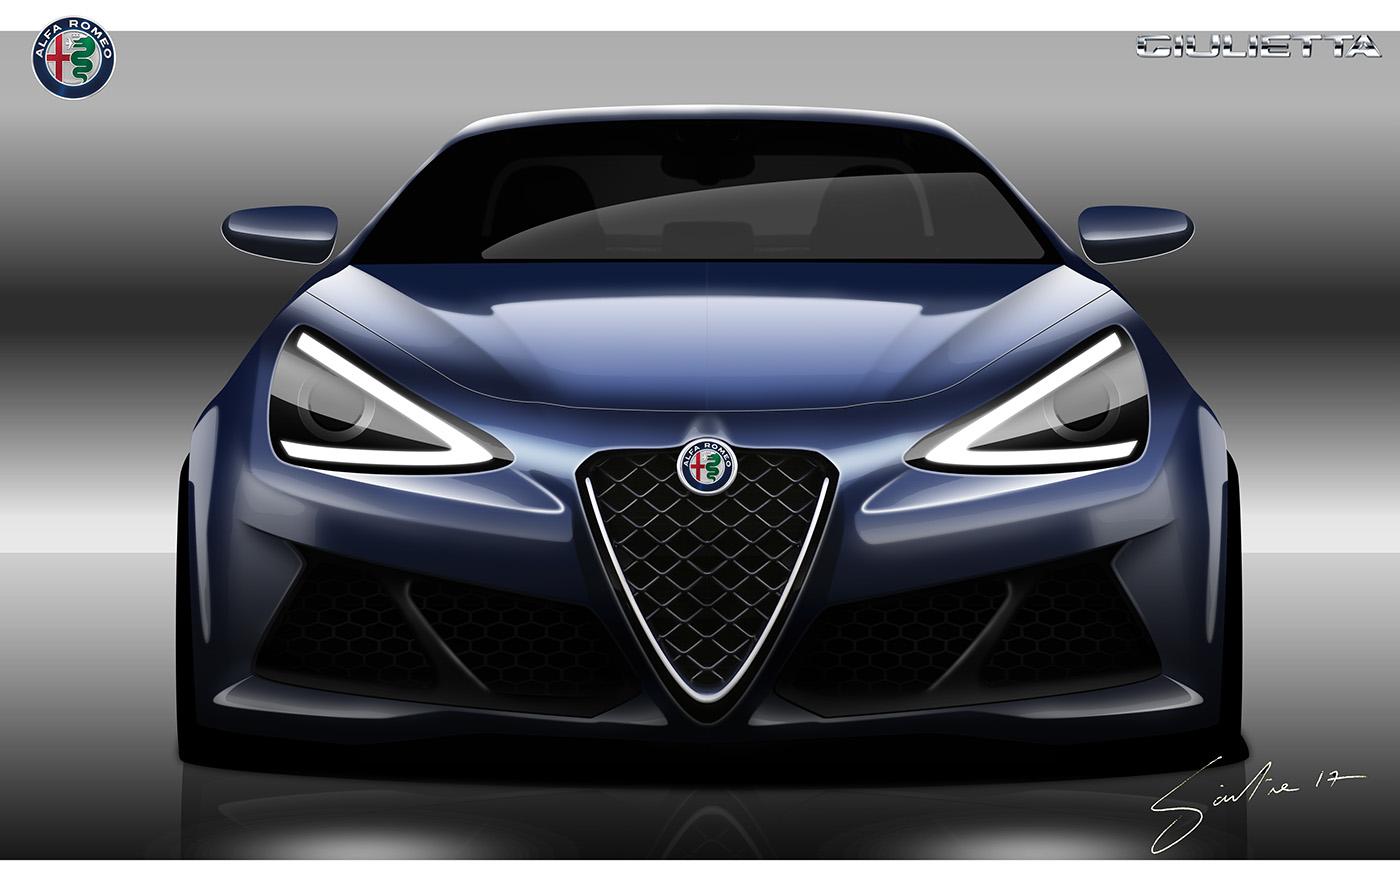 2018_Alfa_Romeo_Giulietta_rendering_03